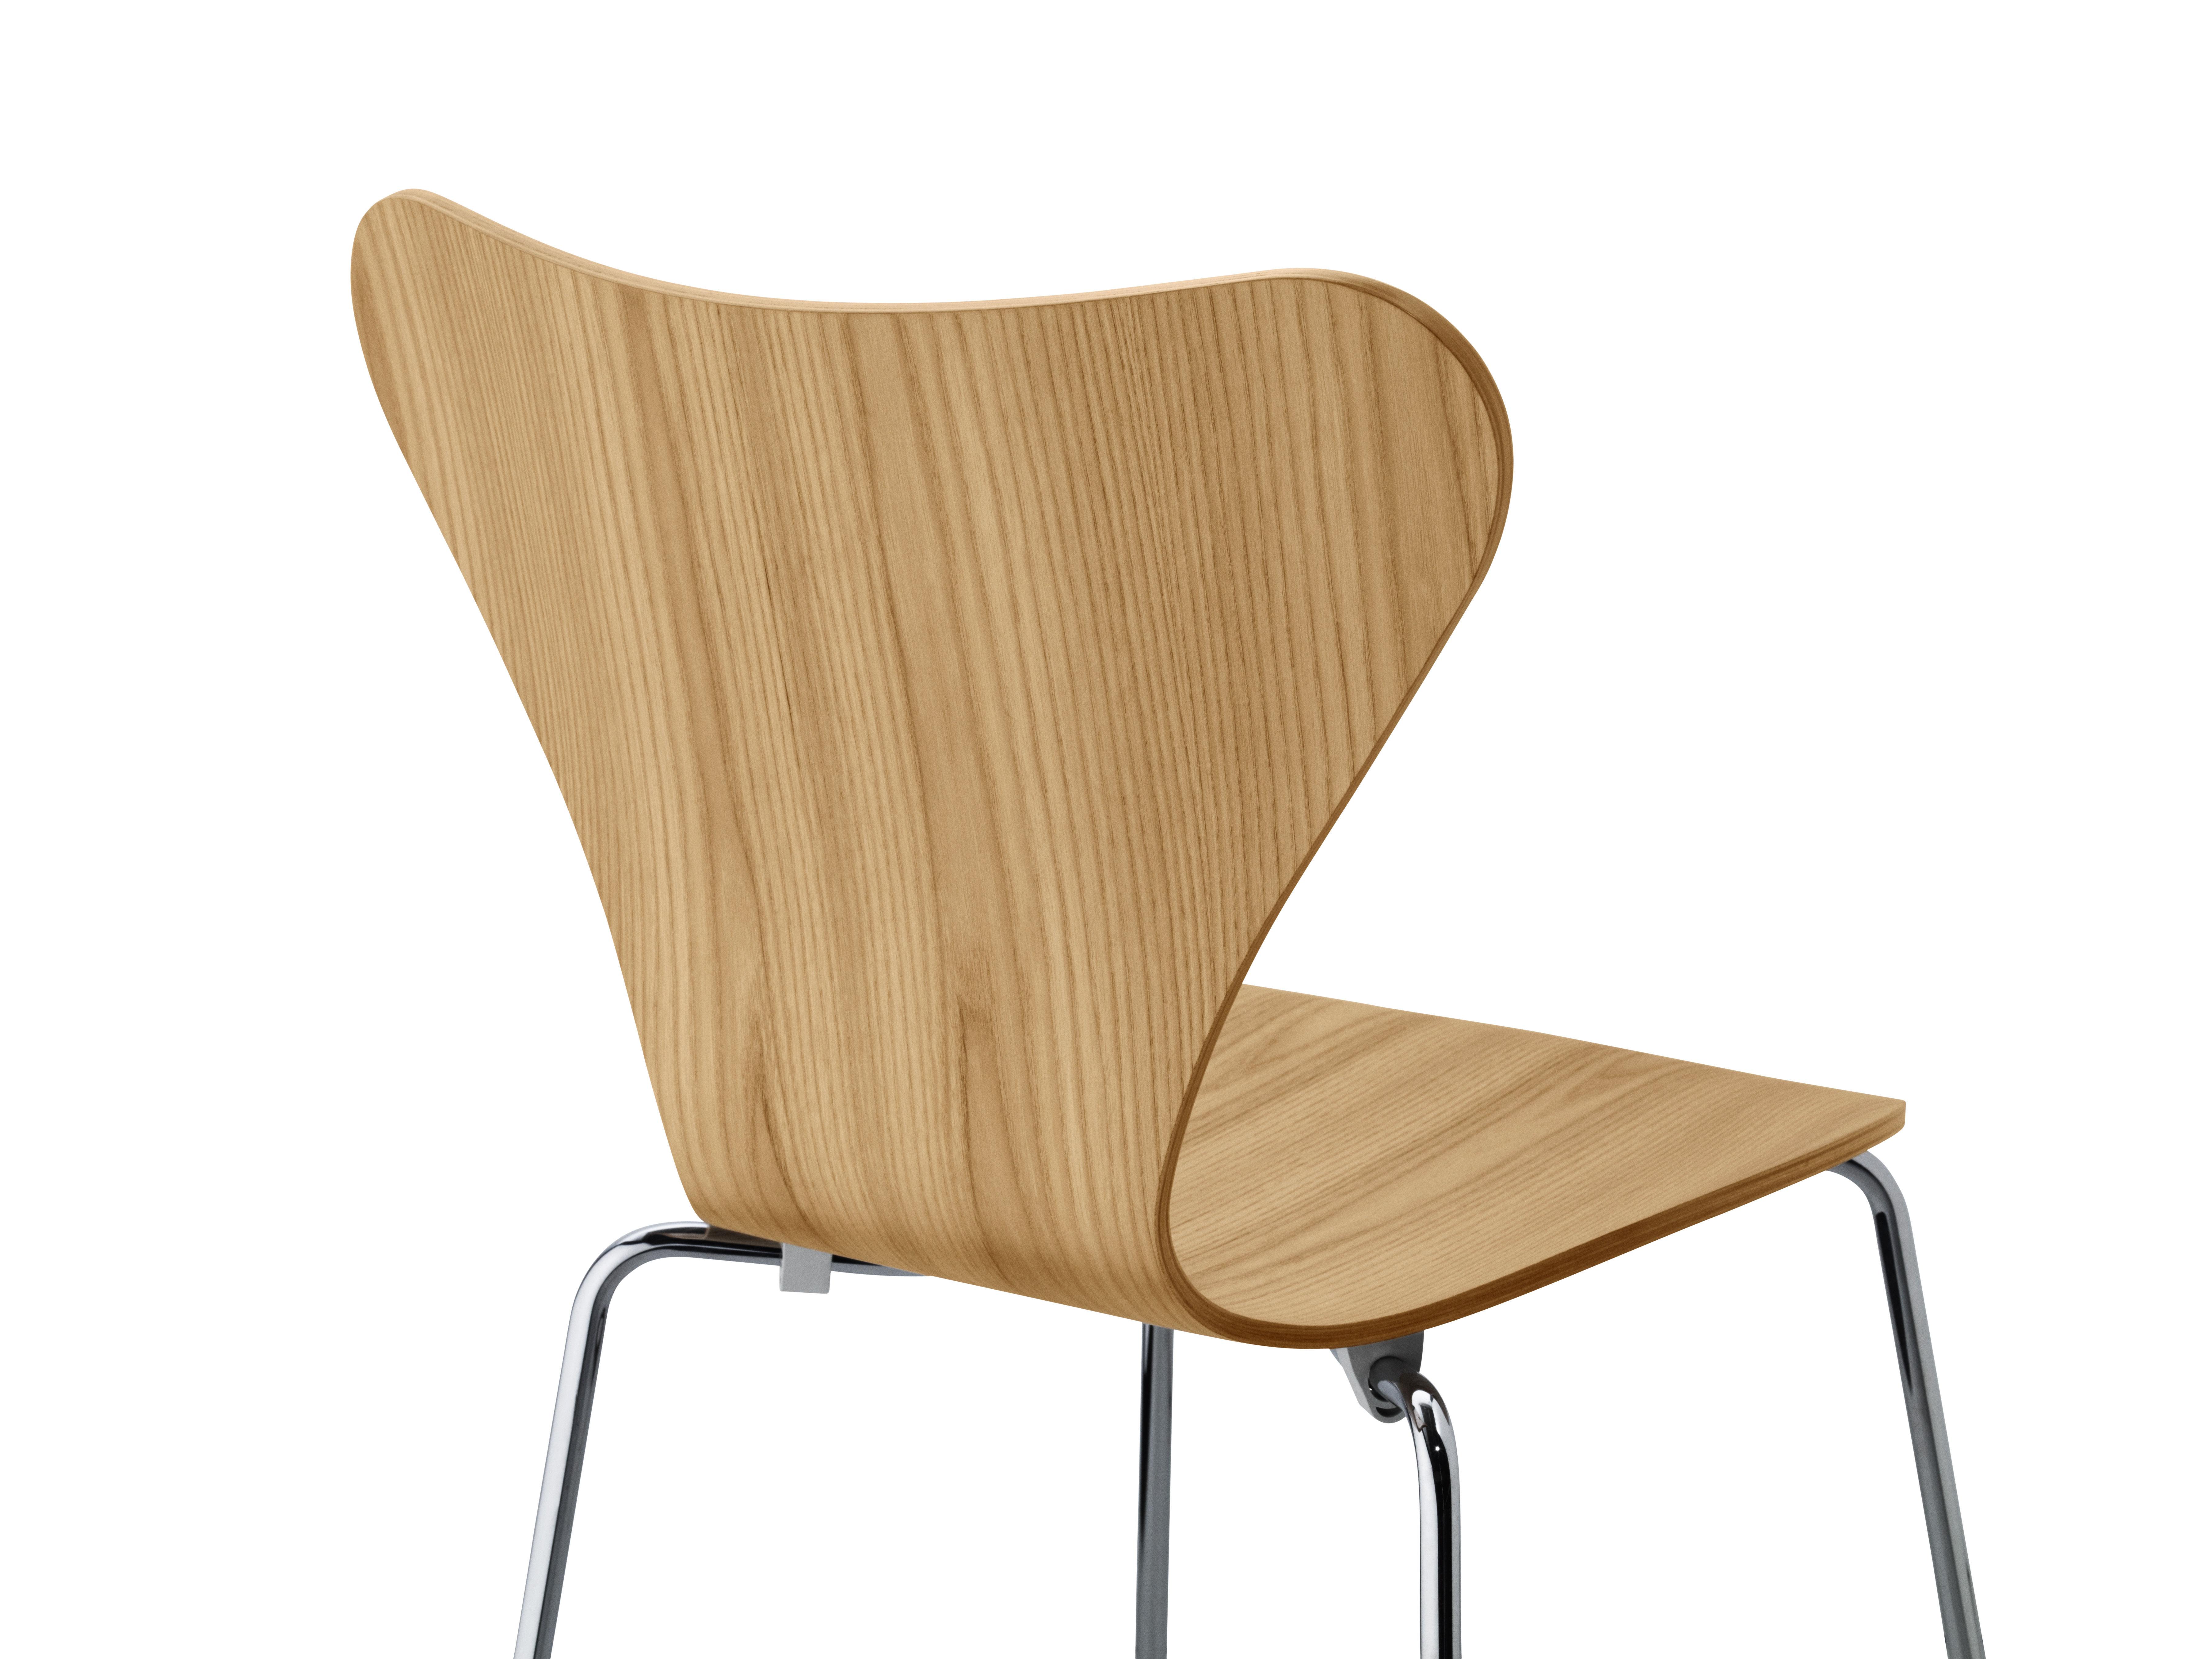 chaise empilable s rie 7 bois naturel orme fritz hansen. Black Bedroom Furniture Sets. Home Design Ideas